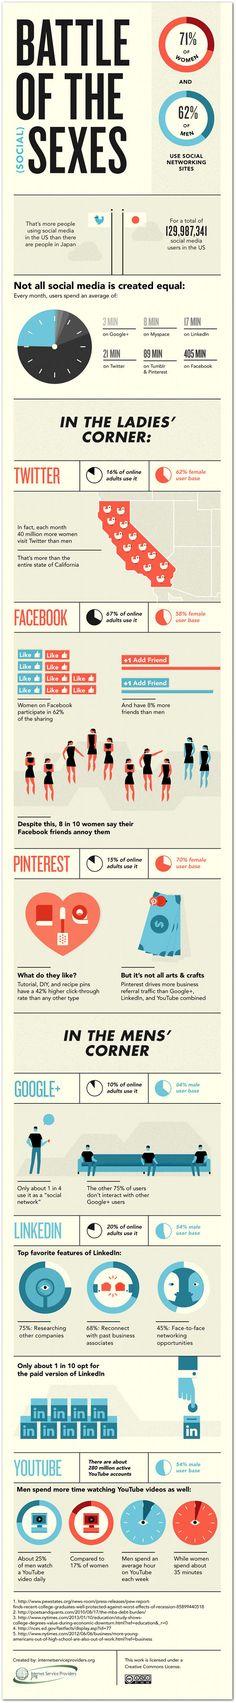 Battle of the sexes: infographic mannen-vs-vrouwen on social media Inbound Marketing, Marketing Digital, Content Marketing, Online Marketing, Social Media Marketing, Social Web, Social Stats, Social Trends, Info Board